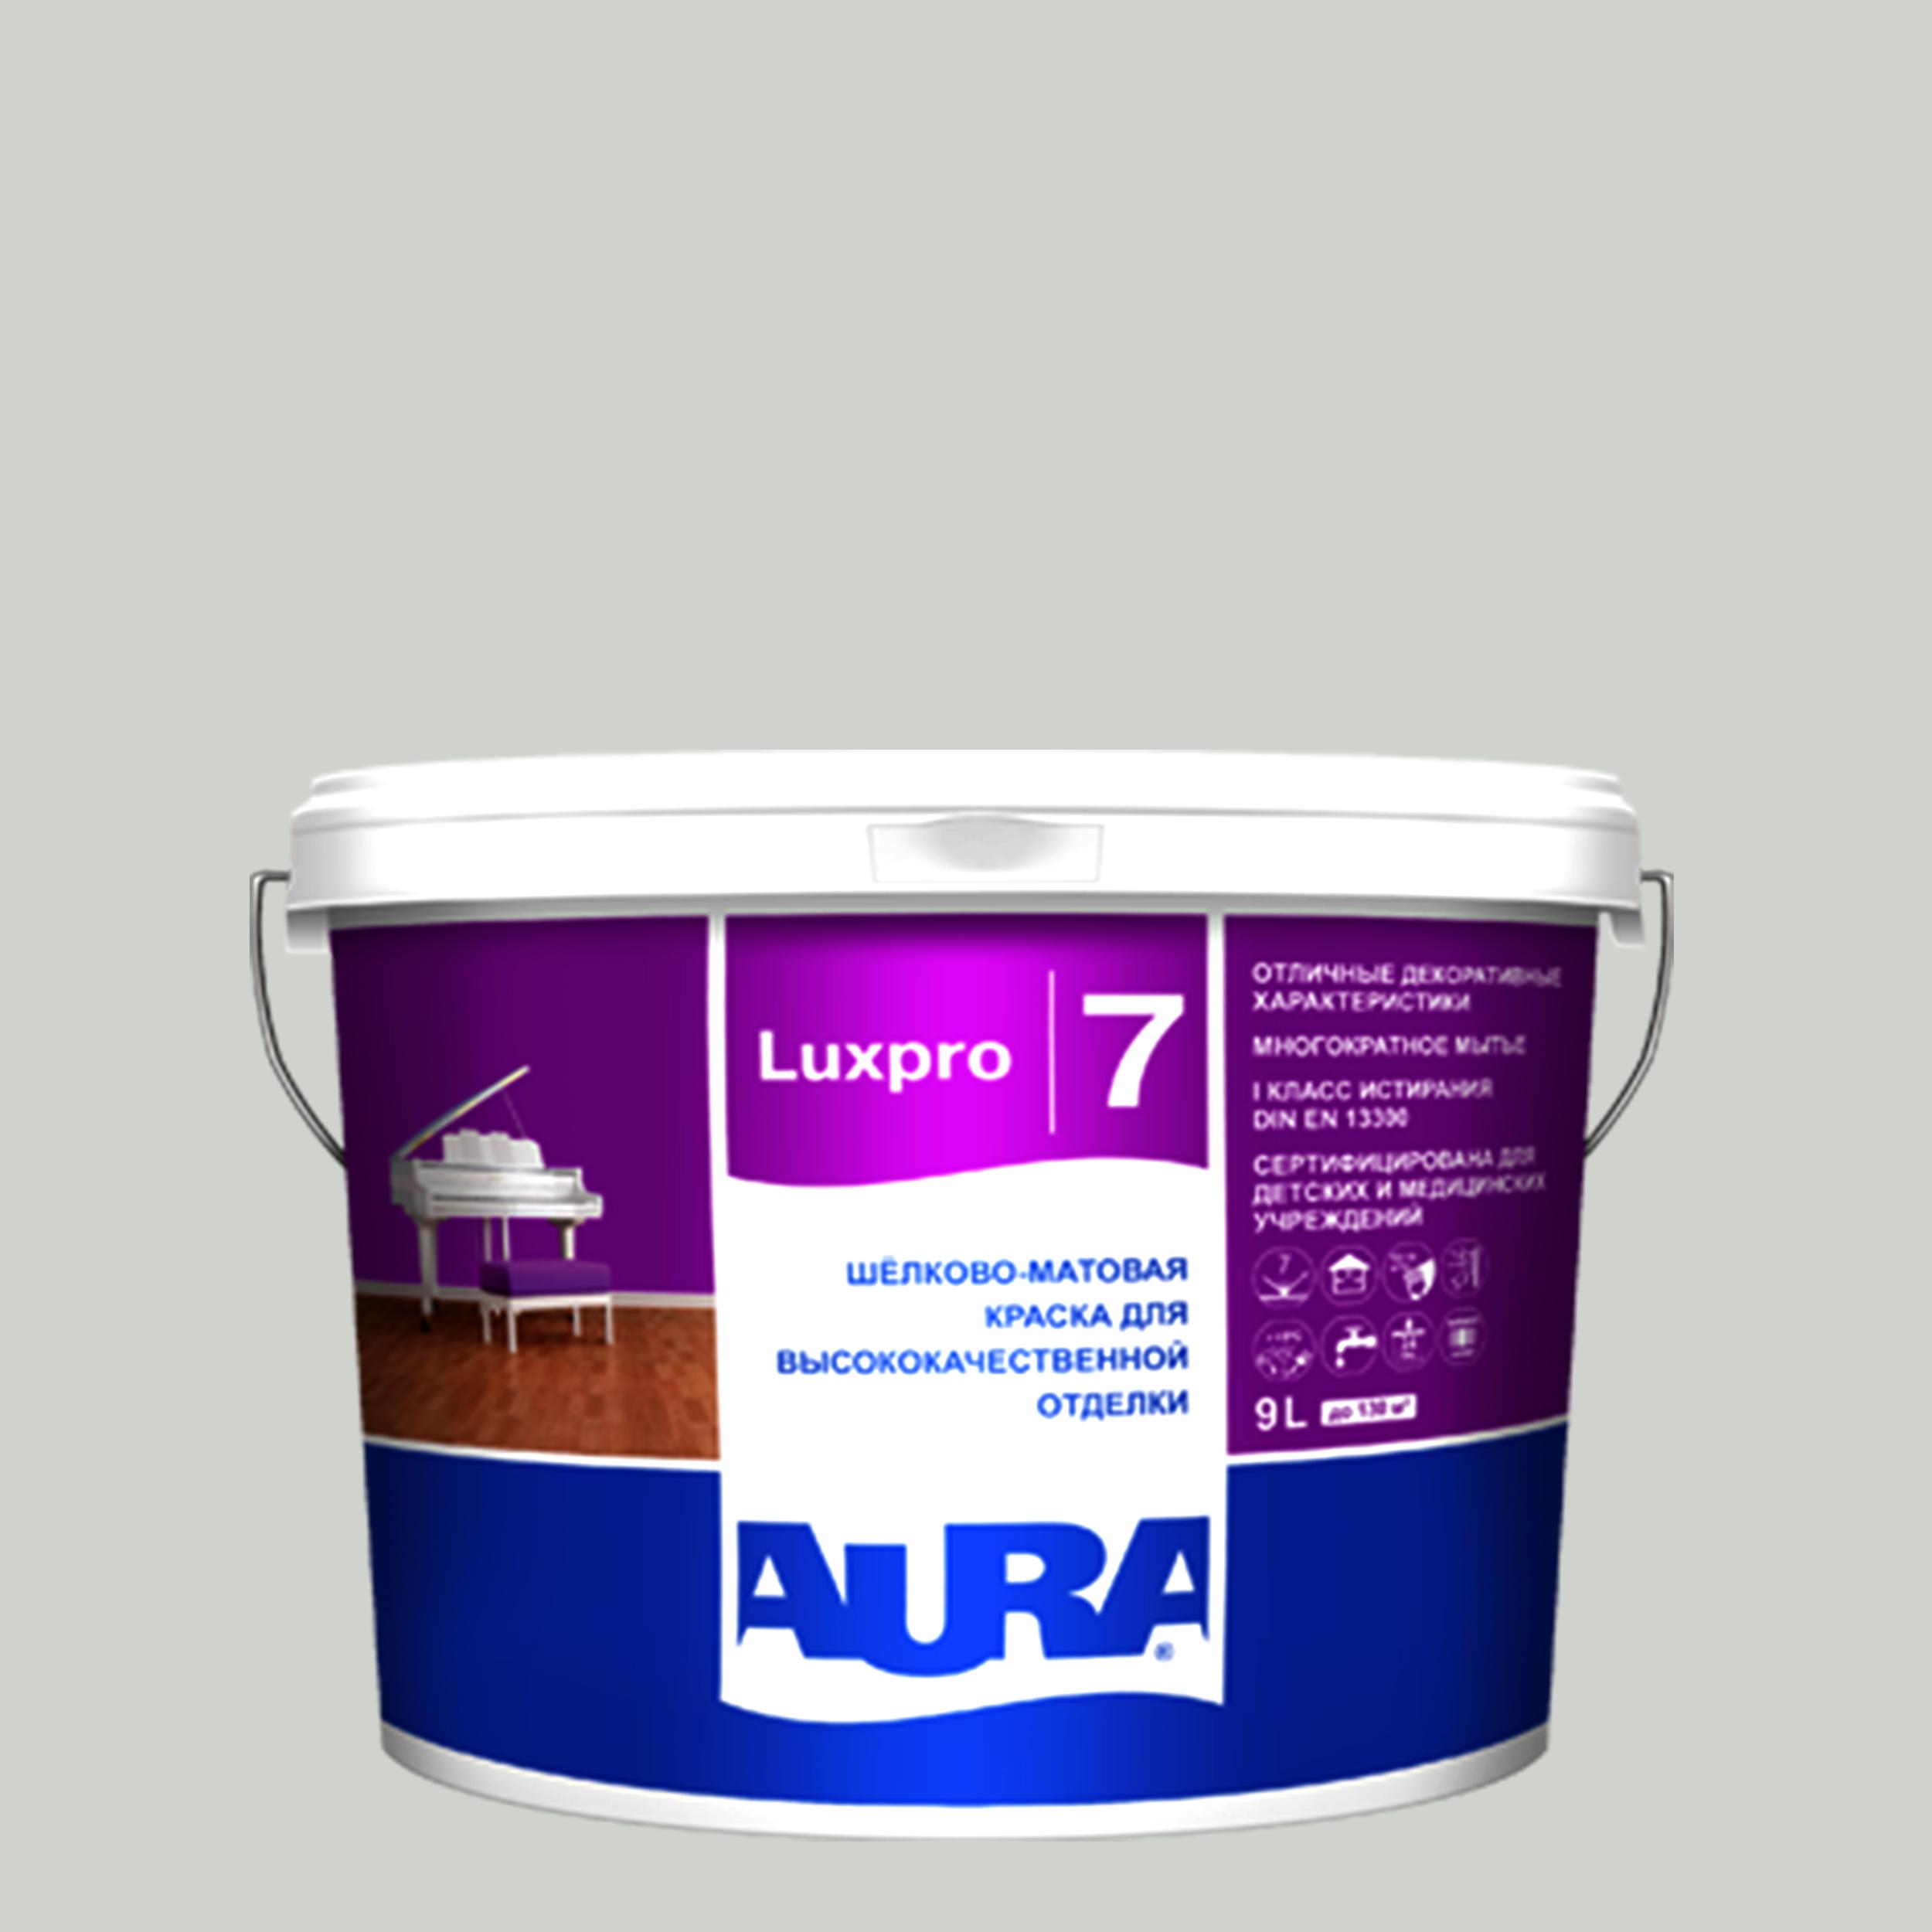 Фото 4 - Краска интерьерная, Aura LuxPRO 7, RAL 9017, 11 кг.